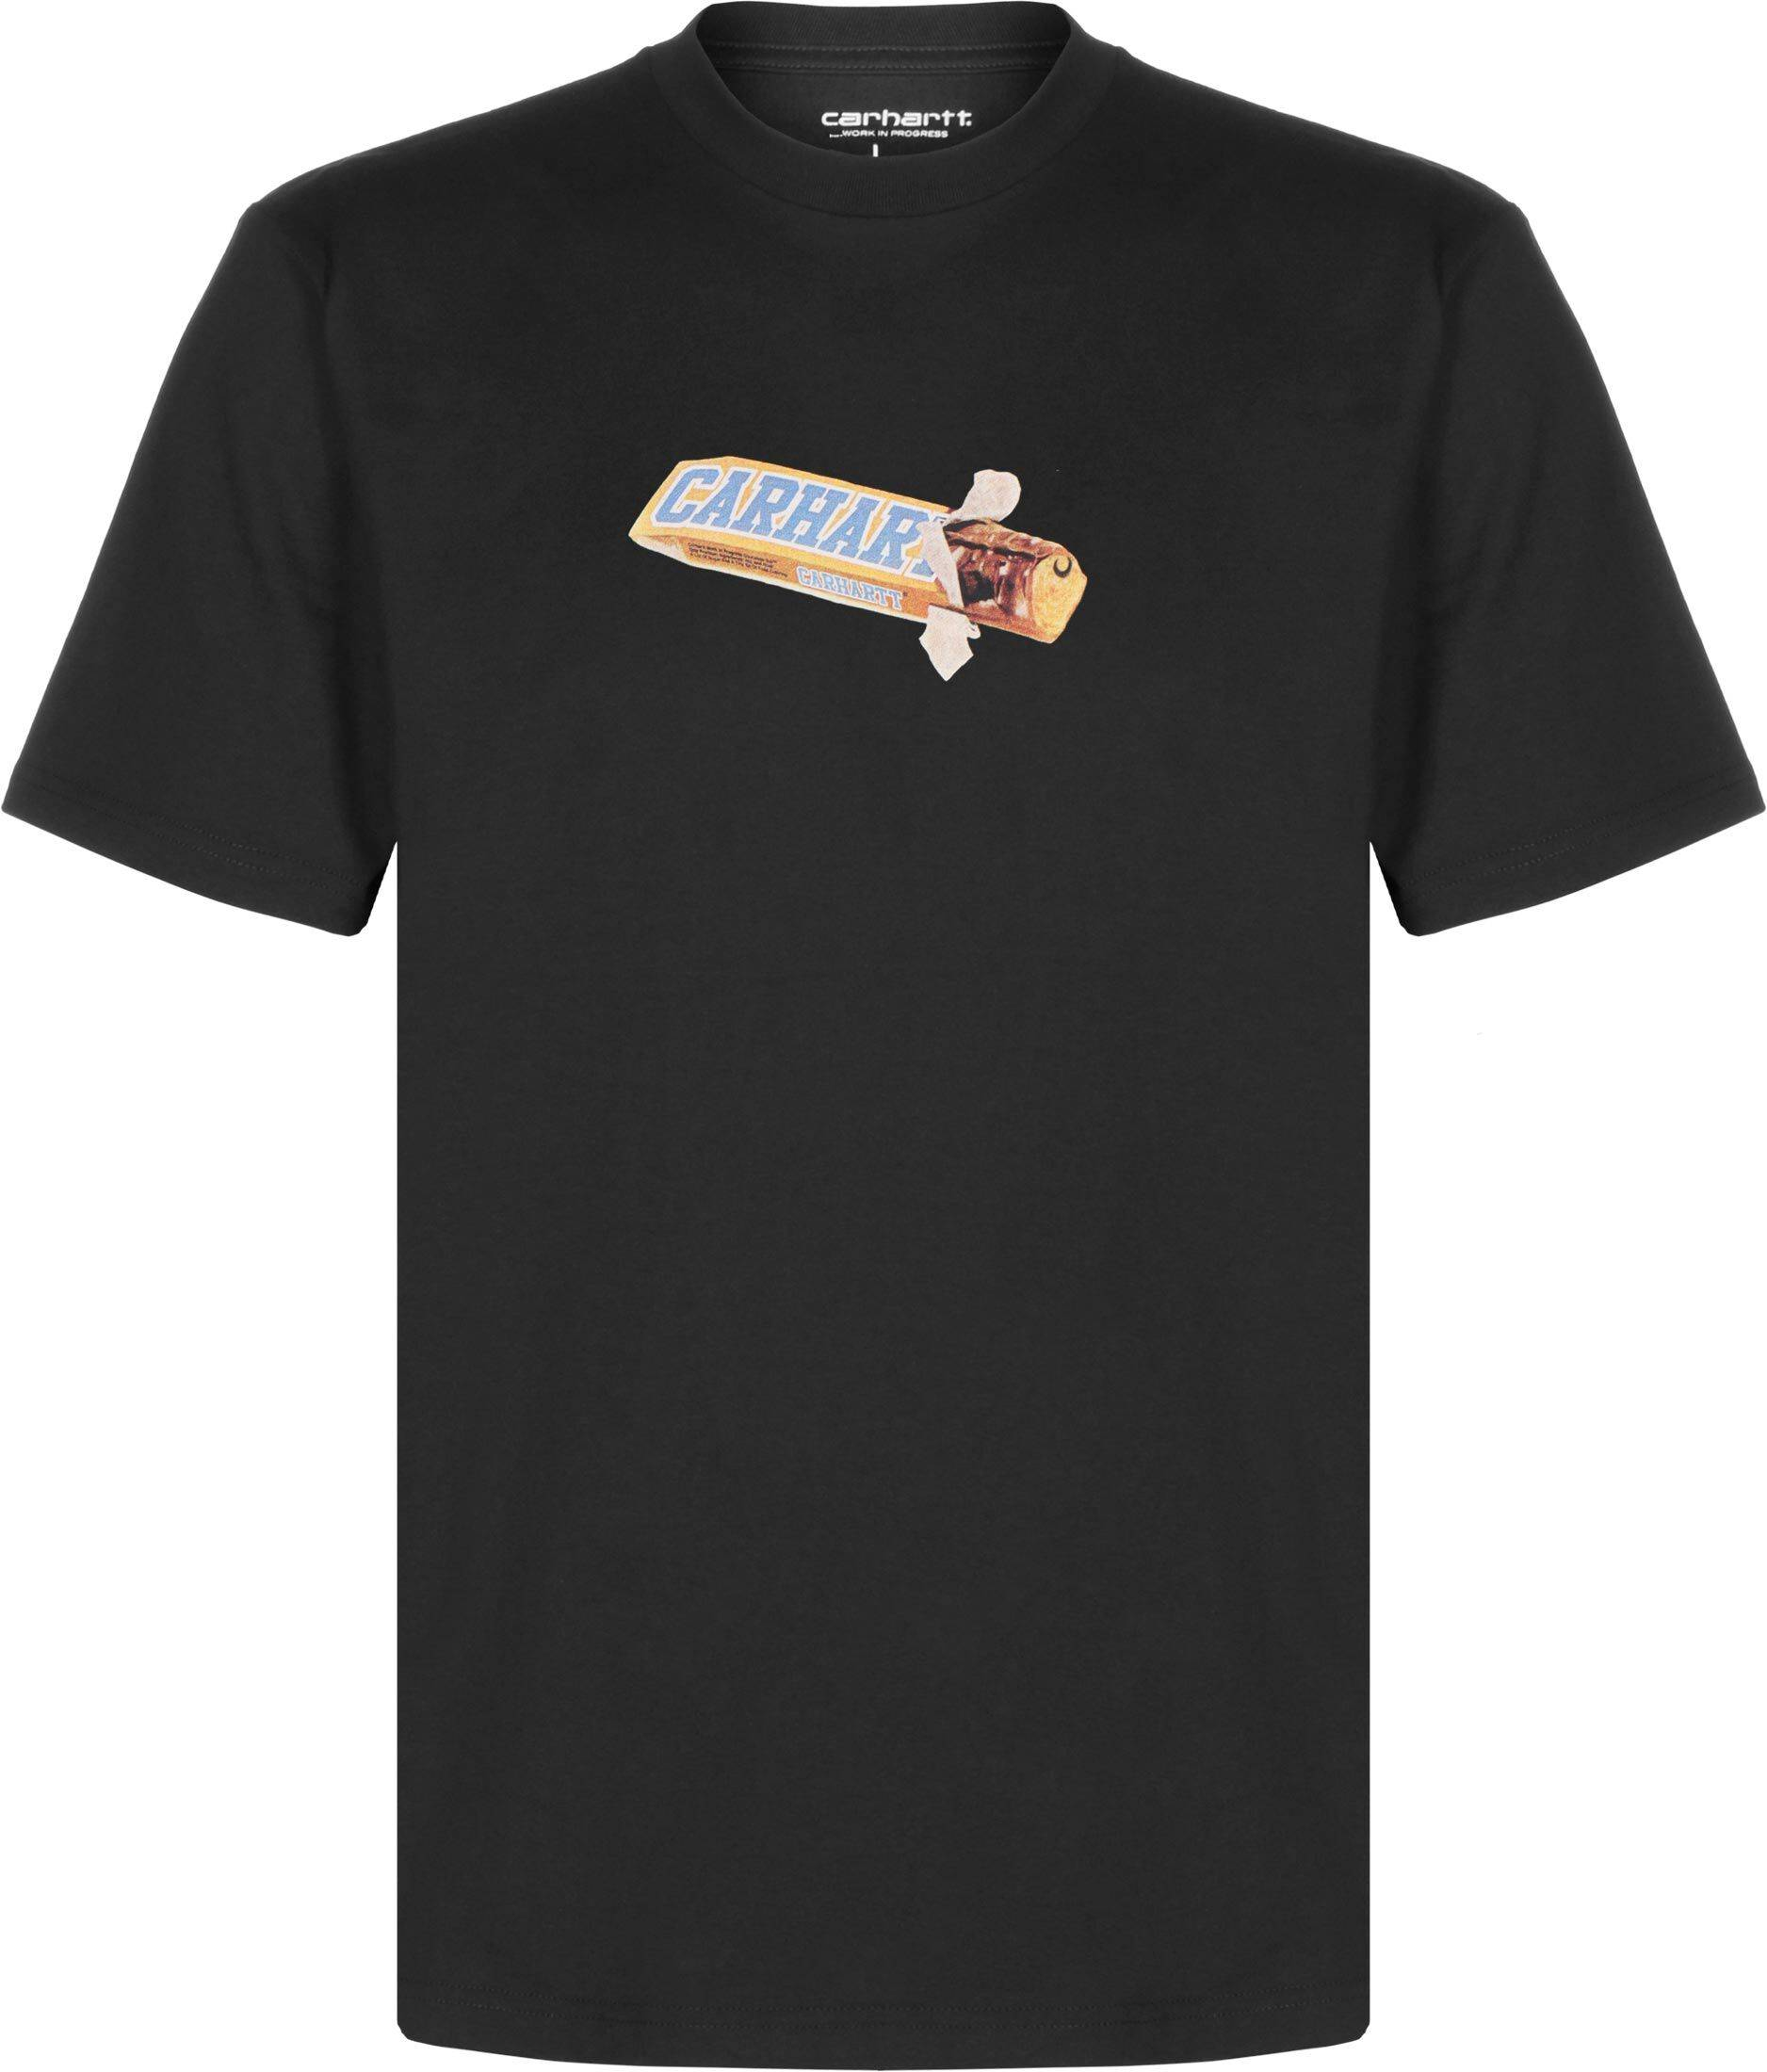 Carhartt WIP Chocolate Bar, taille XS, noir